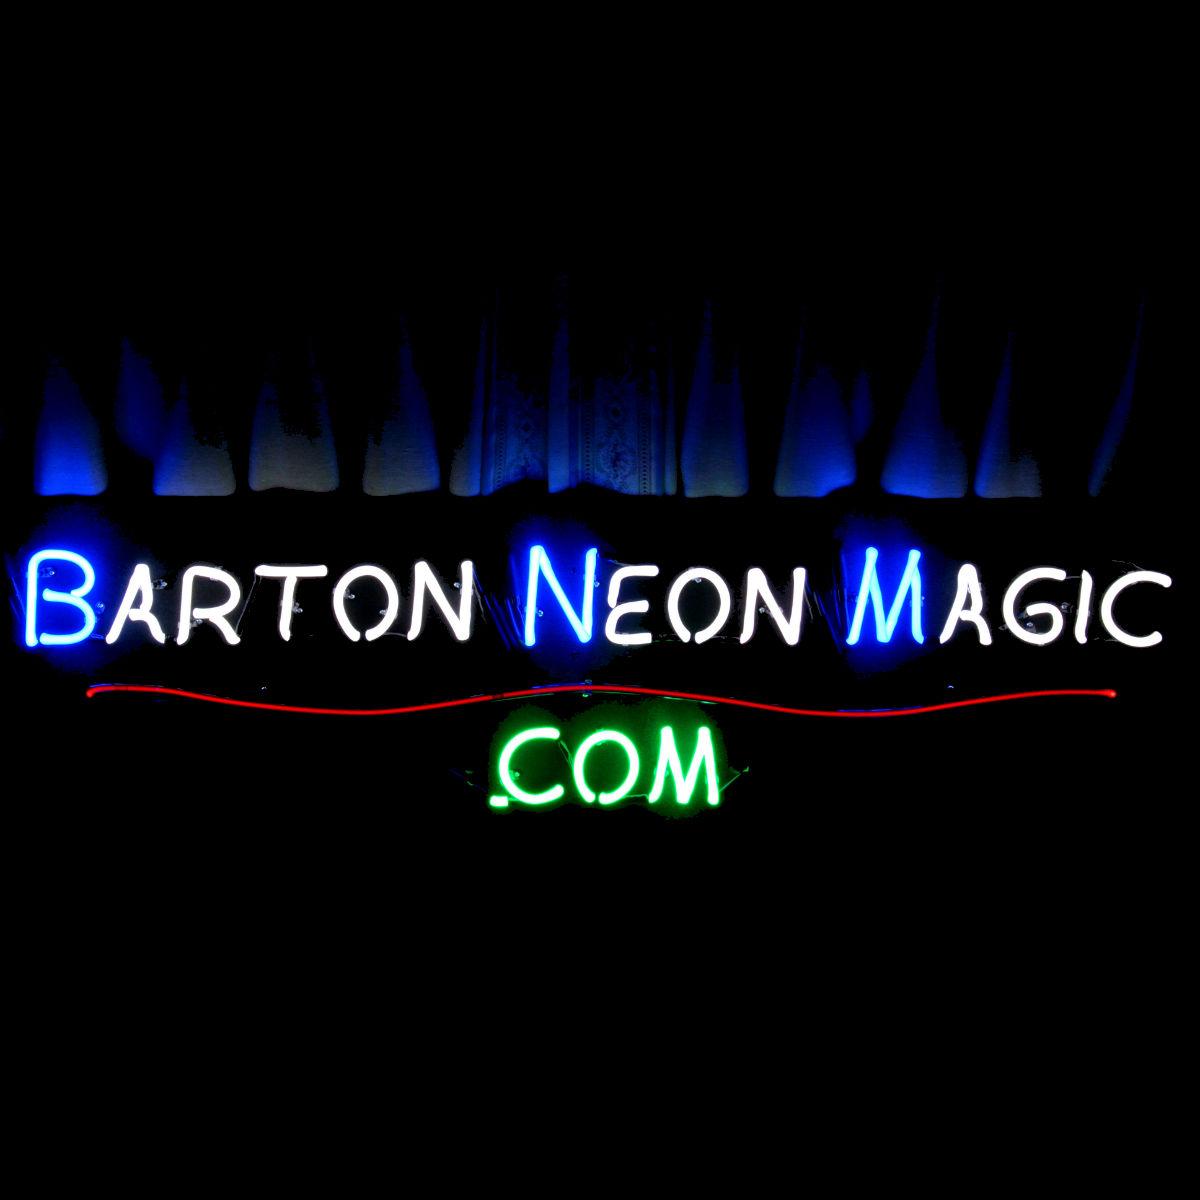 Designer Neon LIghting by John Barton - Internationally Famous USA Neon Light Sculptor